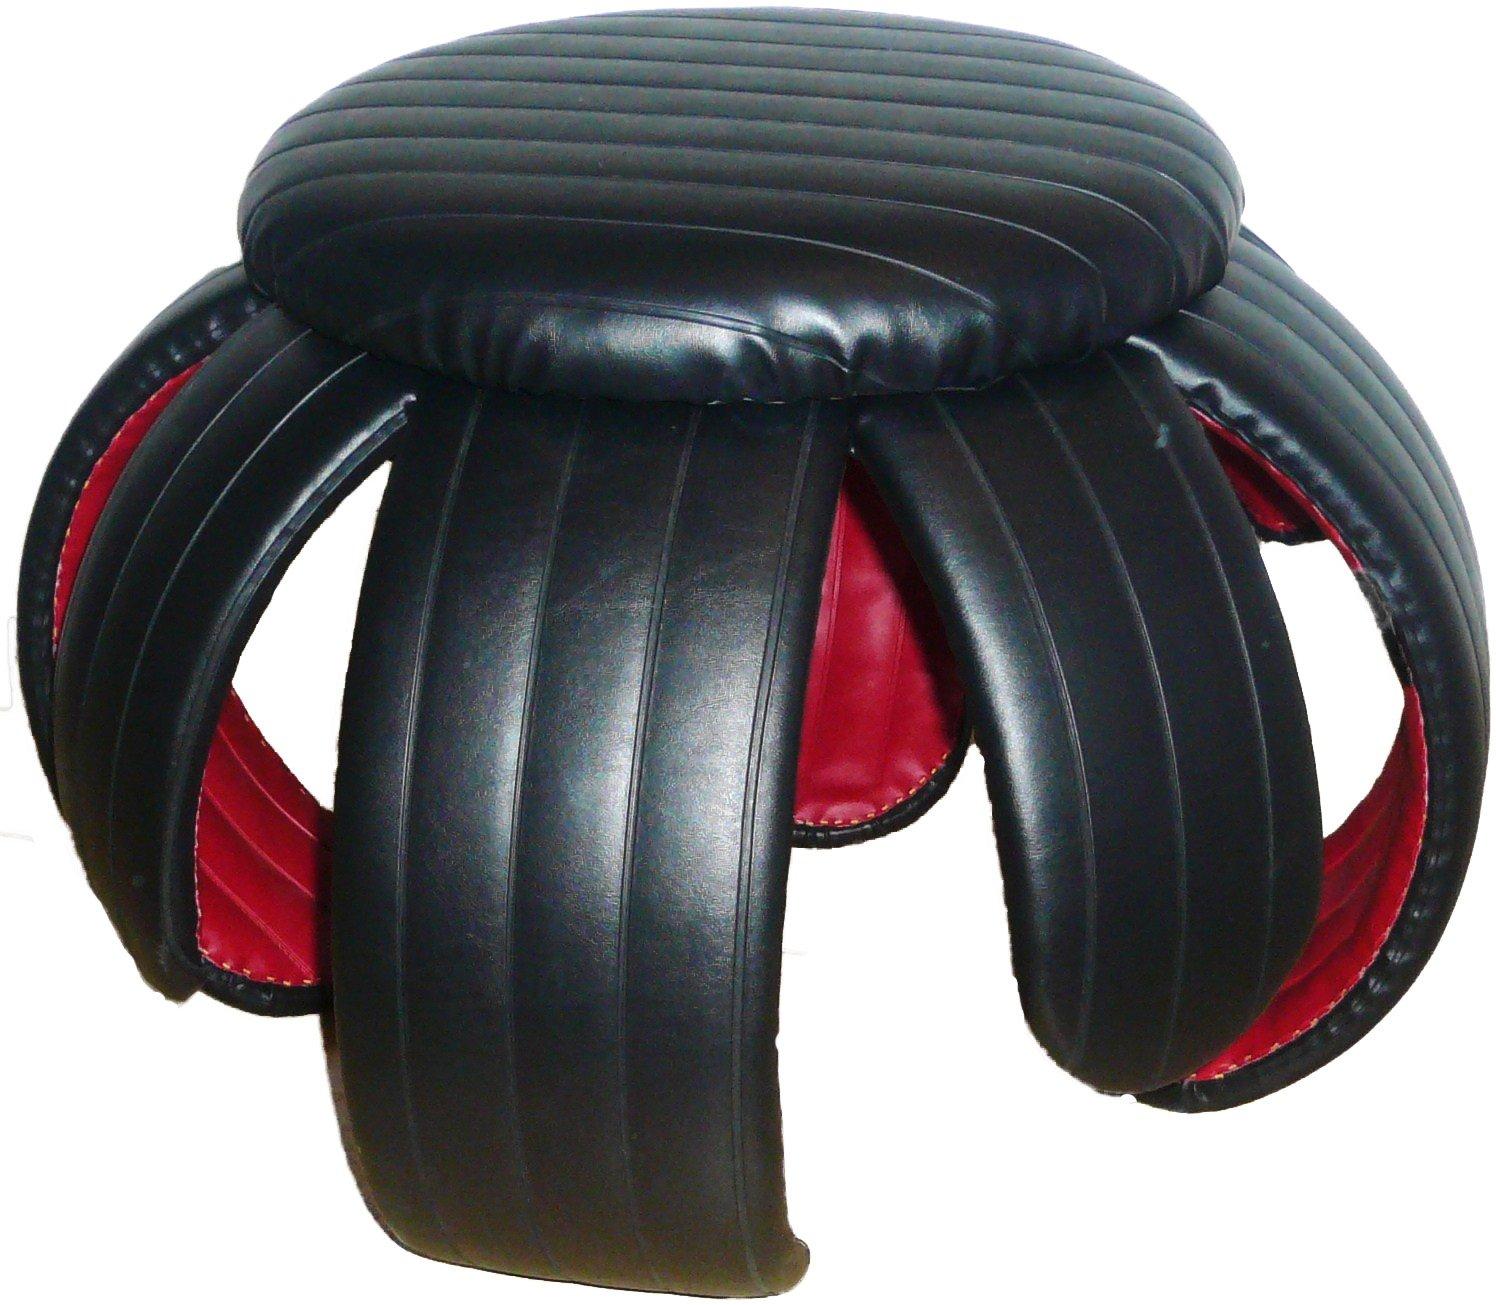 Lawson & Son's BlaSpiS-01 Black Spider Stool by Lawson & Son's